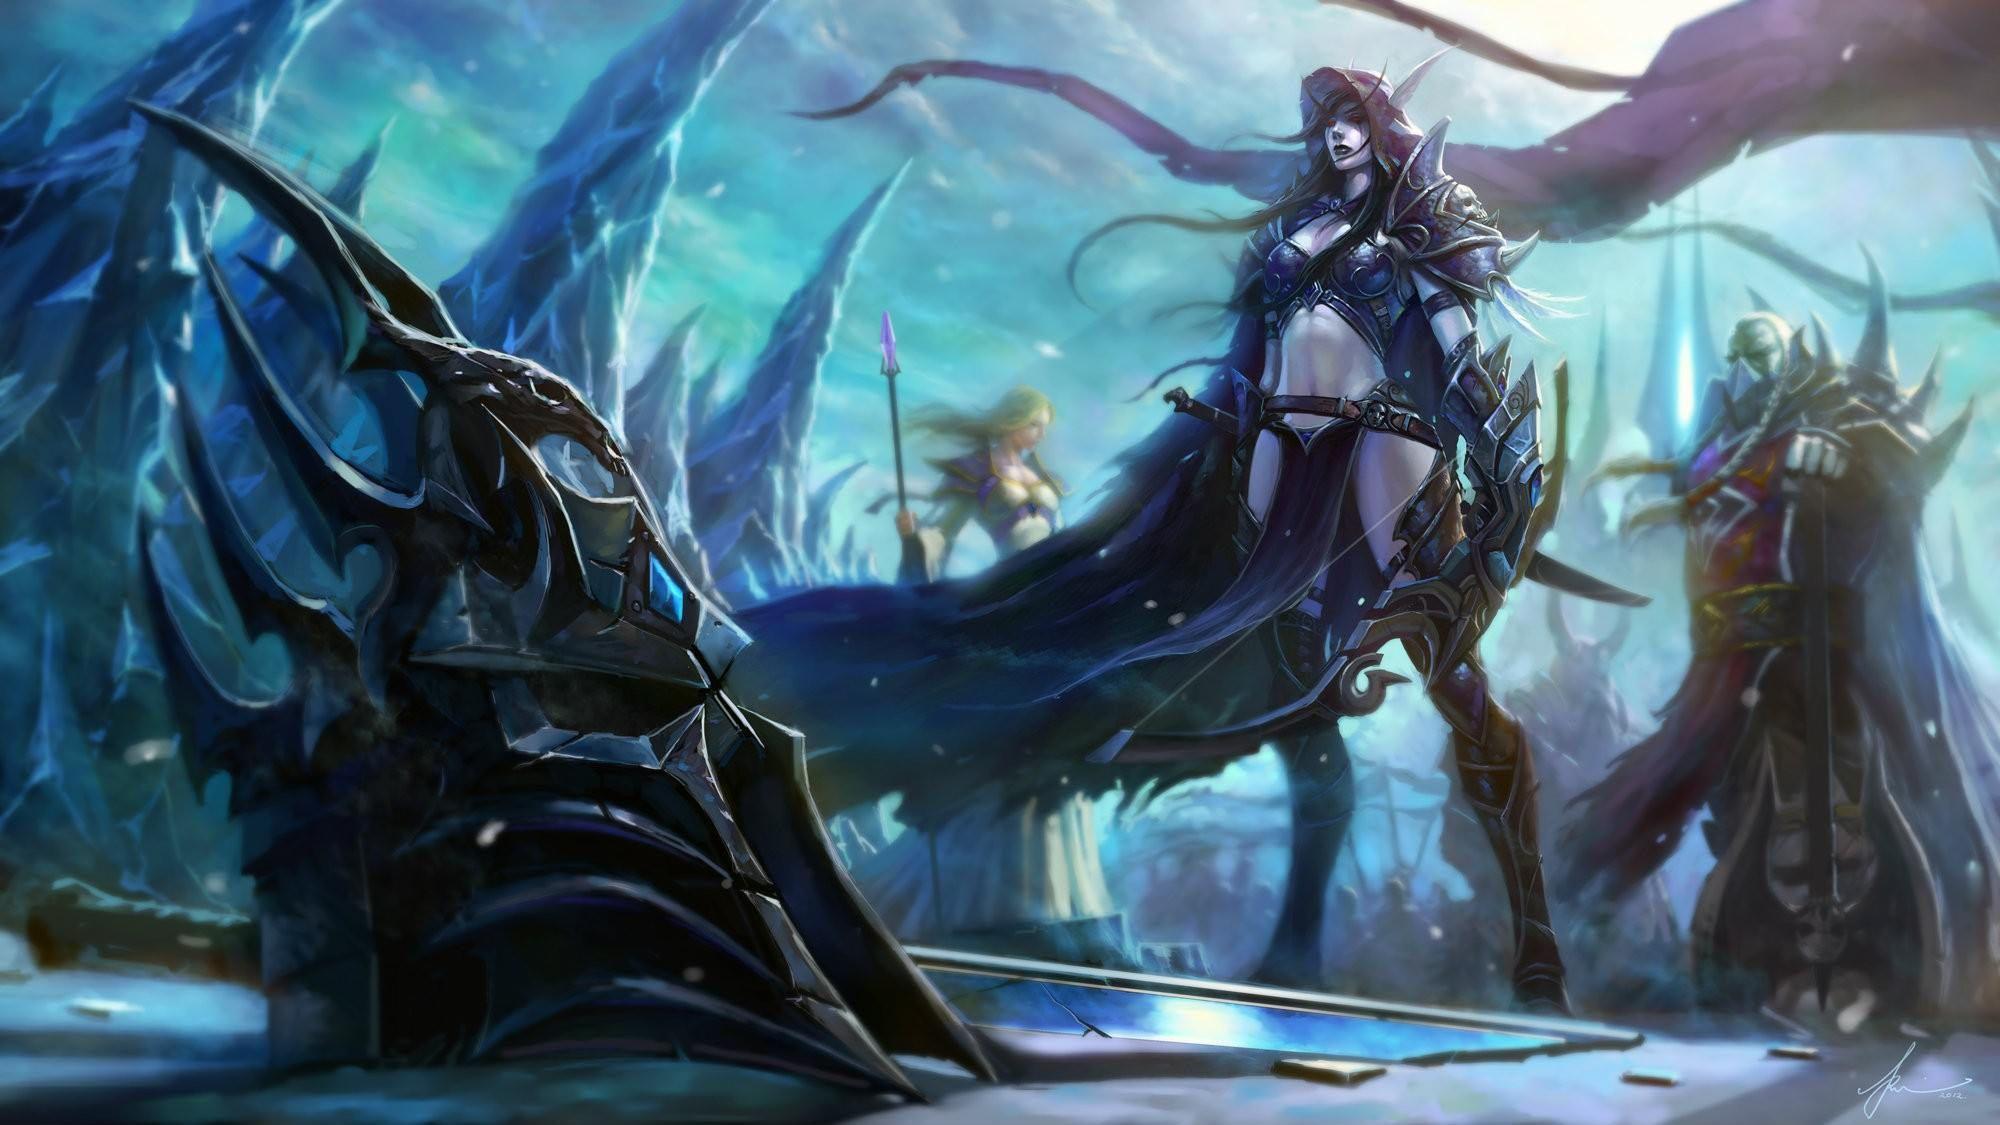 Mobile And Desktop Wallpaper Hd World Of Warcraft Wallpaper Warcraft Art World Of Warcraft Characters